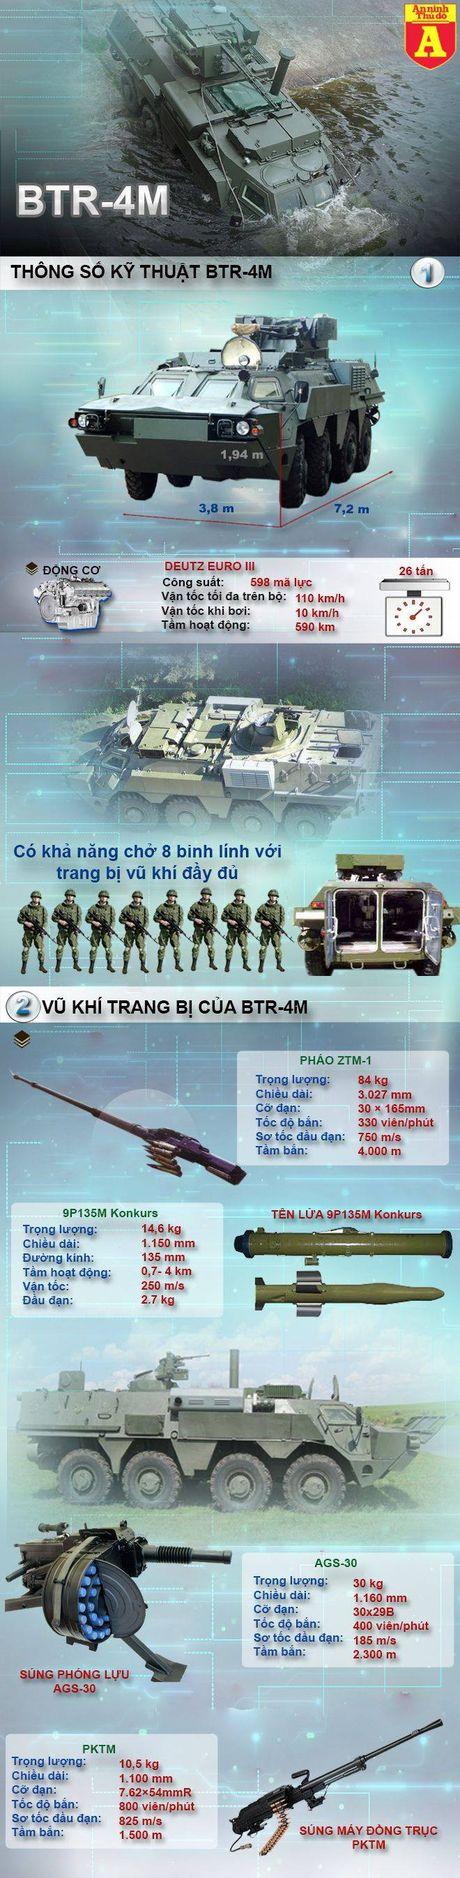 Kham pha tinh nang hien dai cua xe boc thep loi nuoc vua xuat hien o Dong Nam A - Anh 2